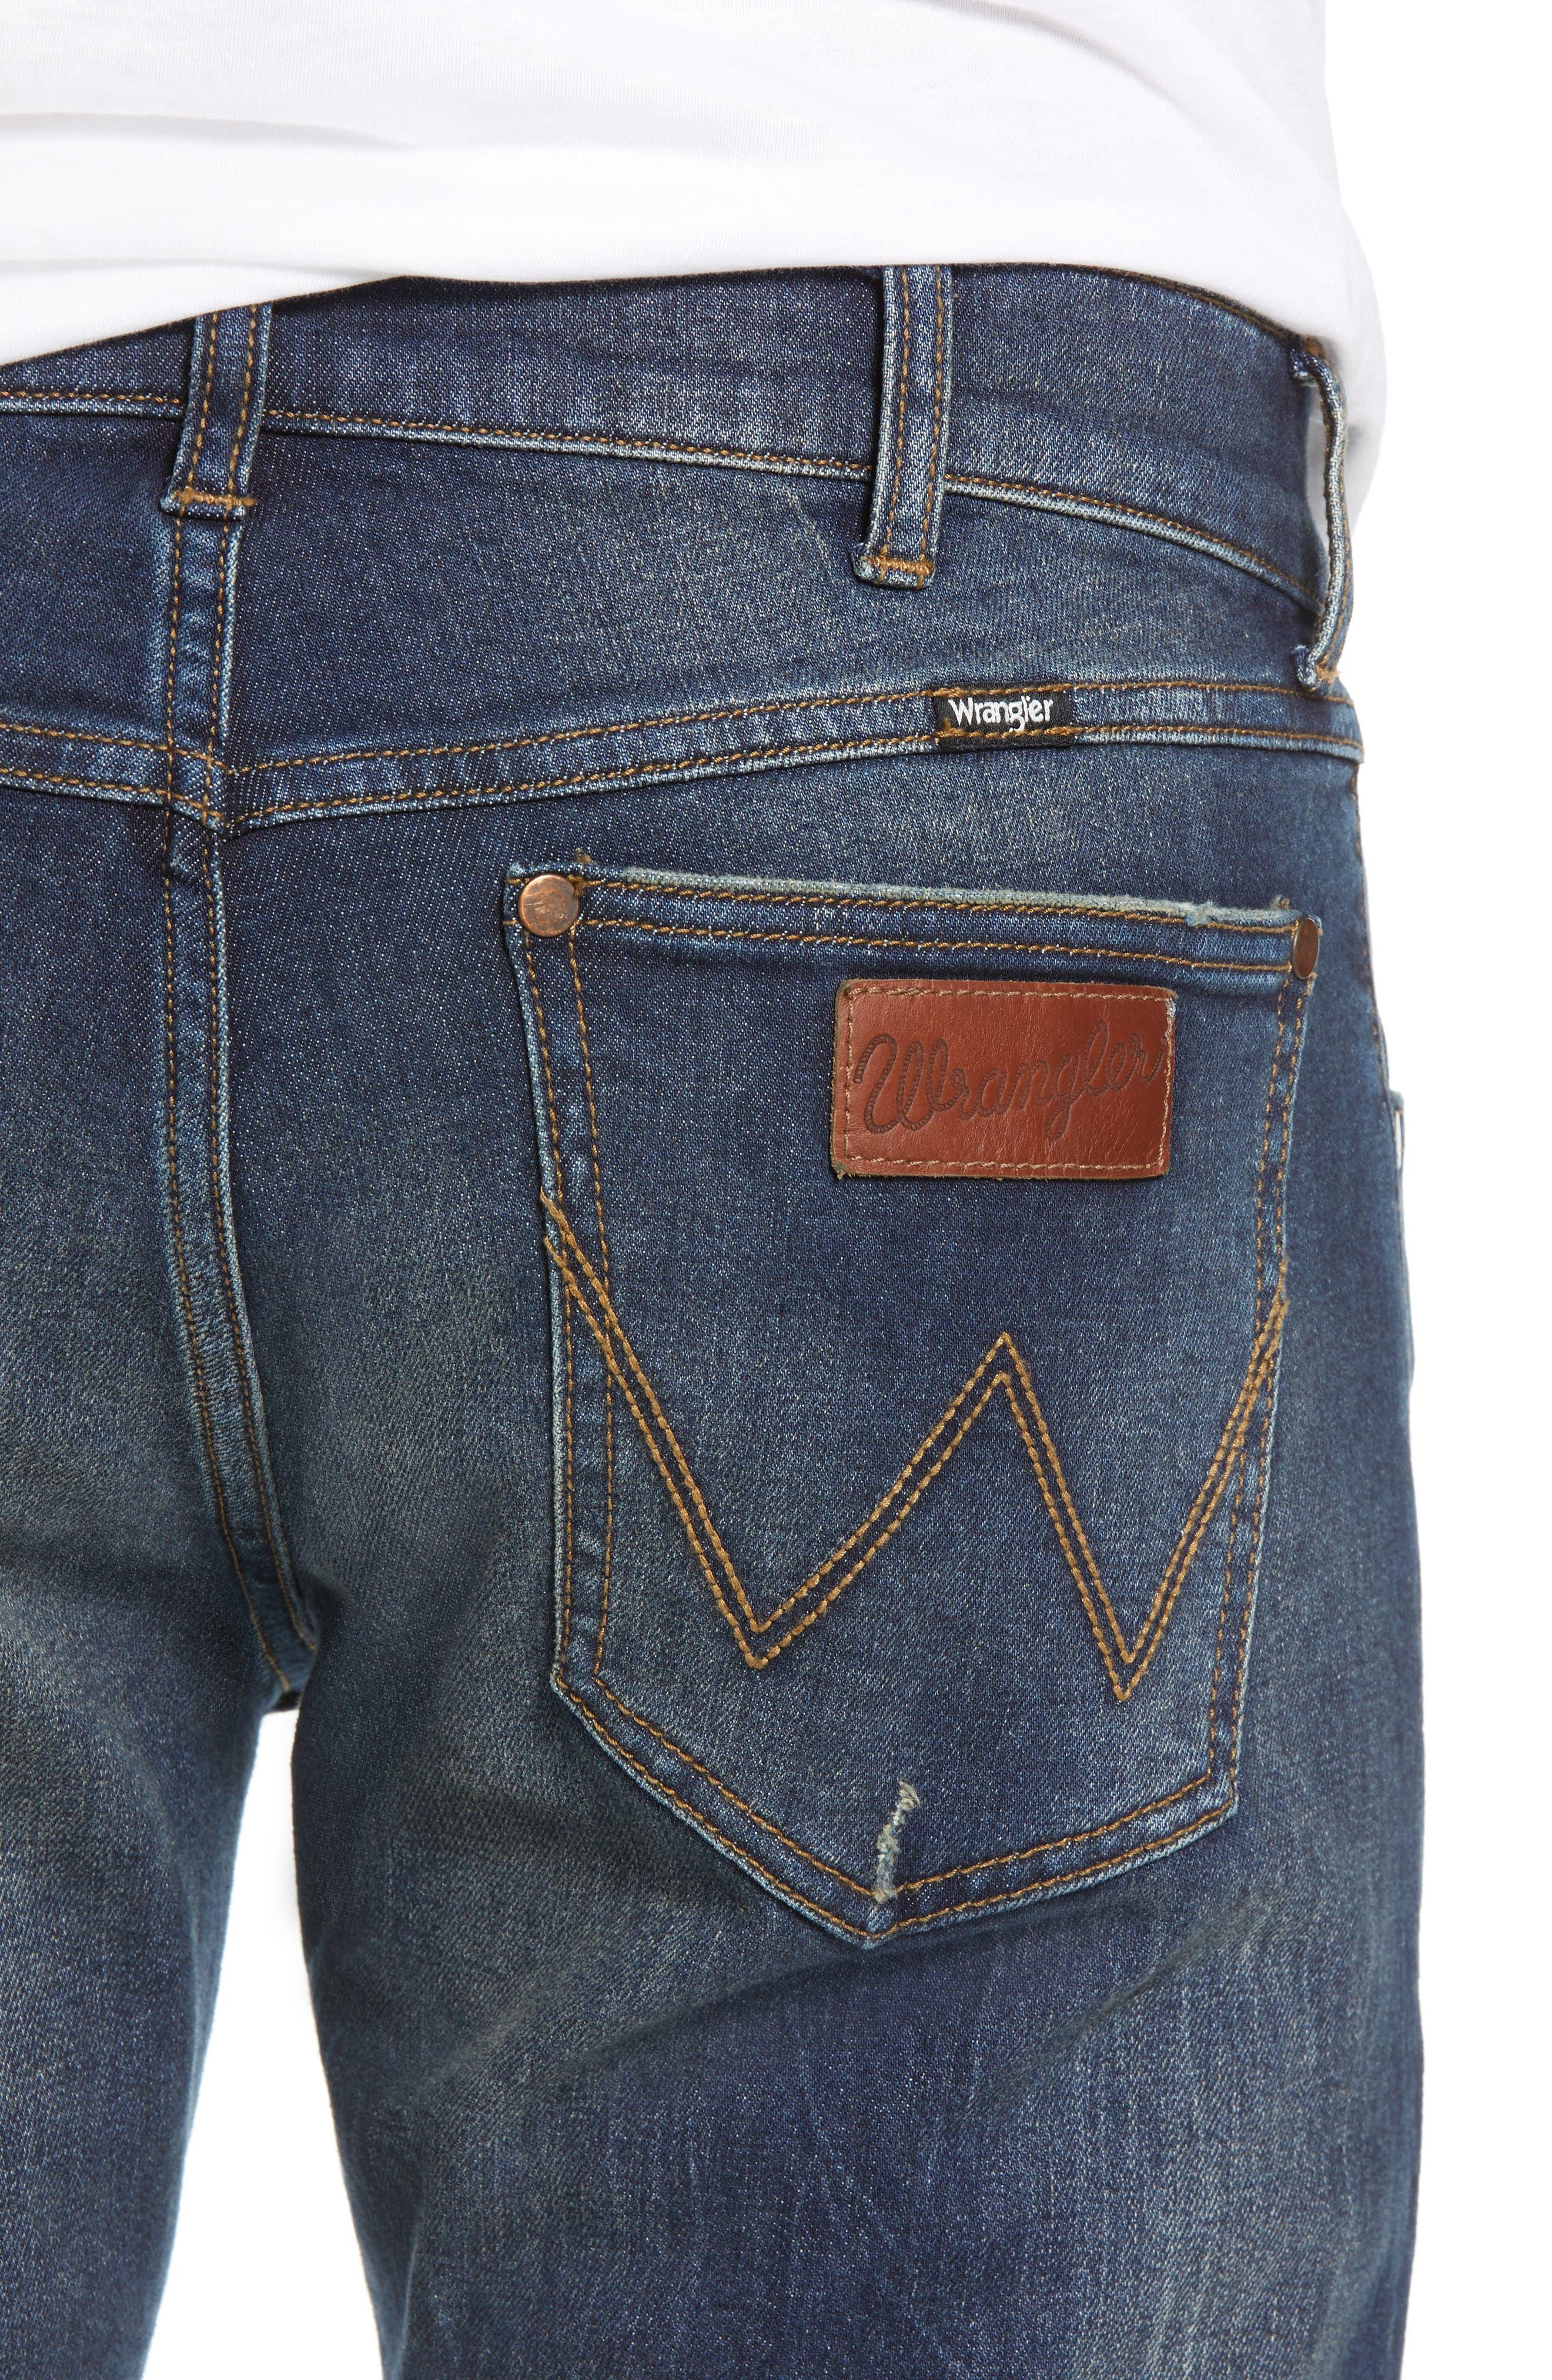 Larston Slim Fit Jeans,                             Alternate thumbnail 4, color,                             VINTAGE DARK